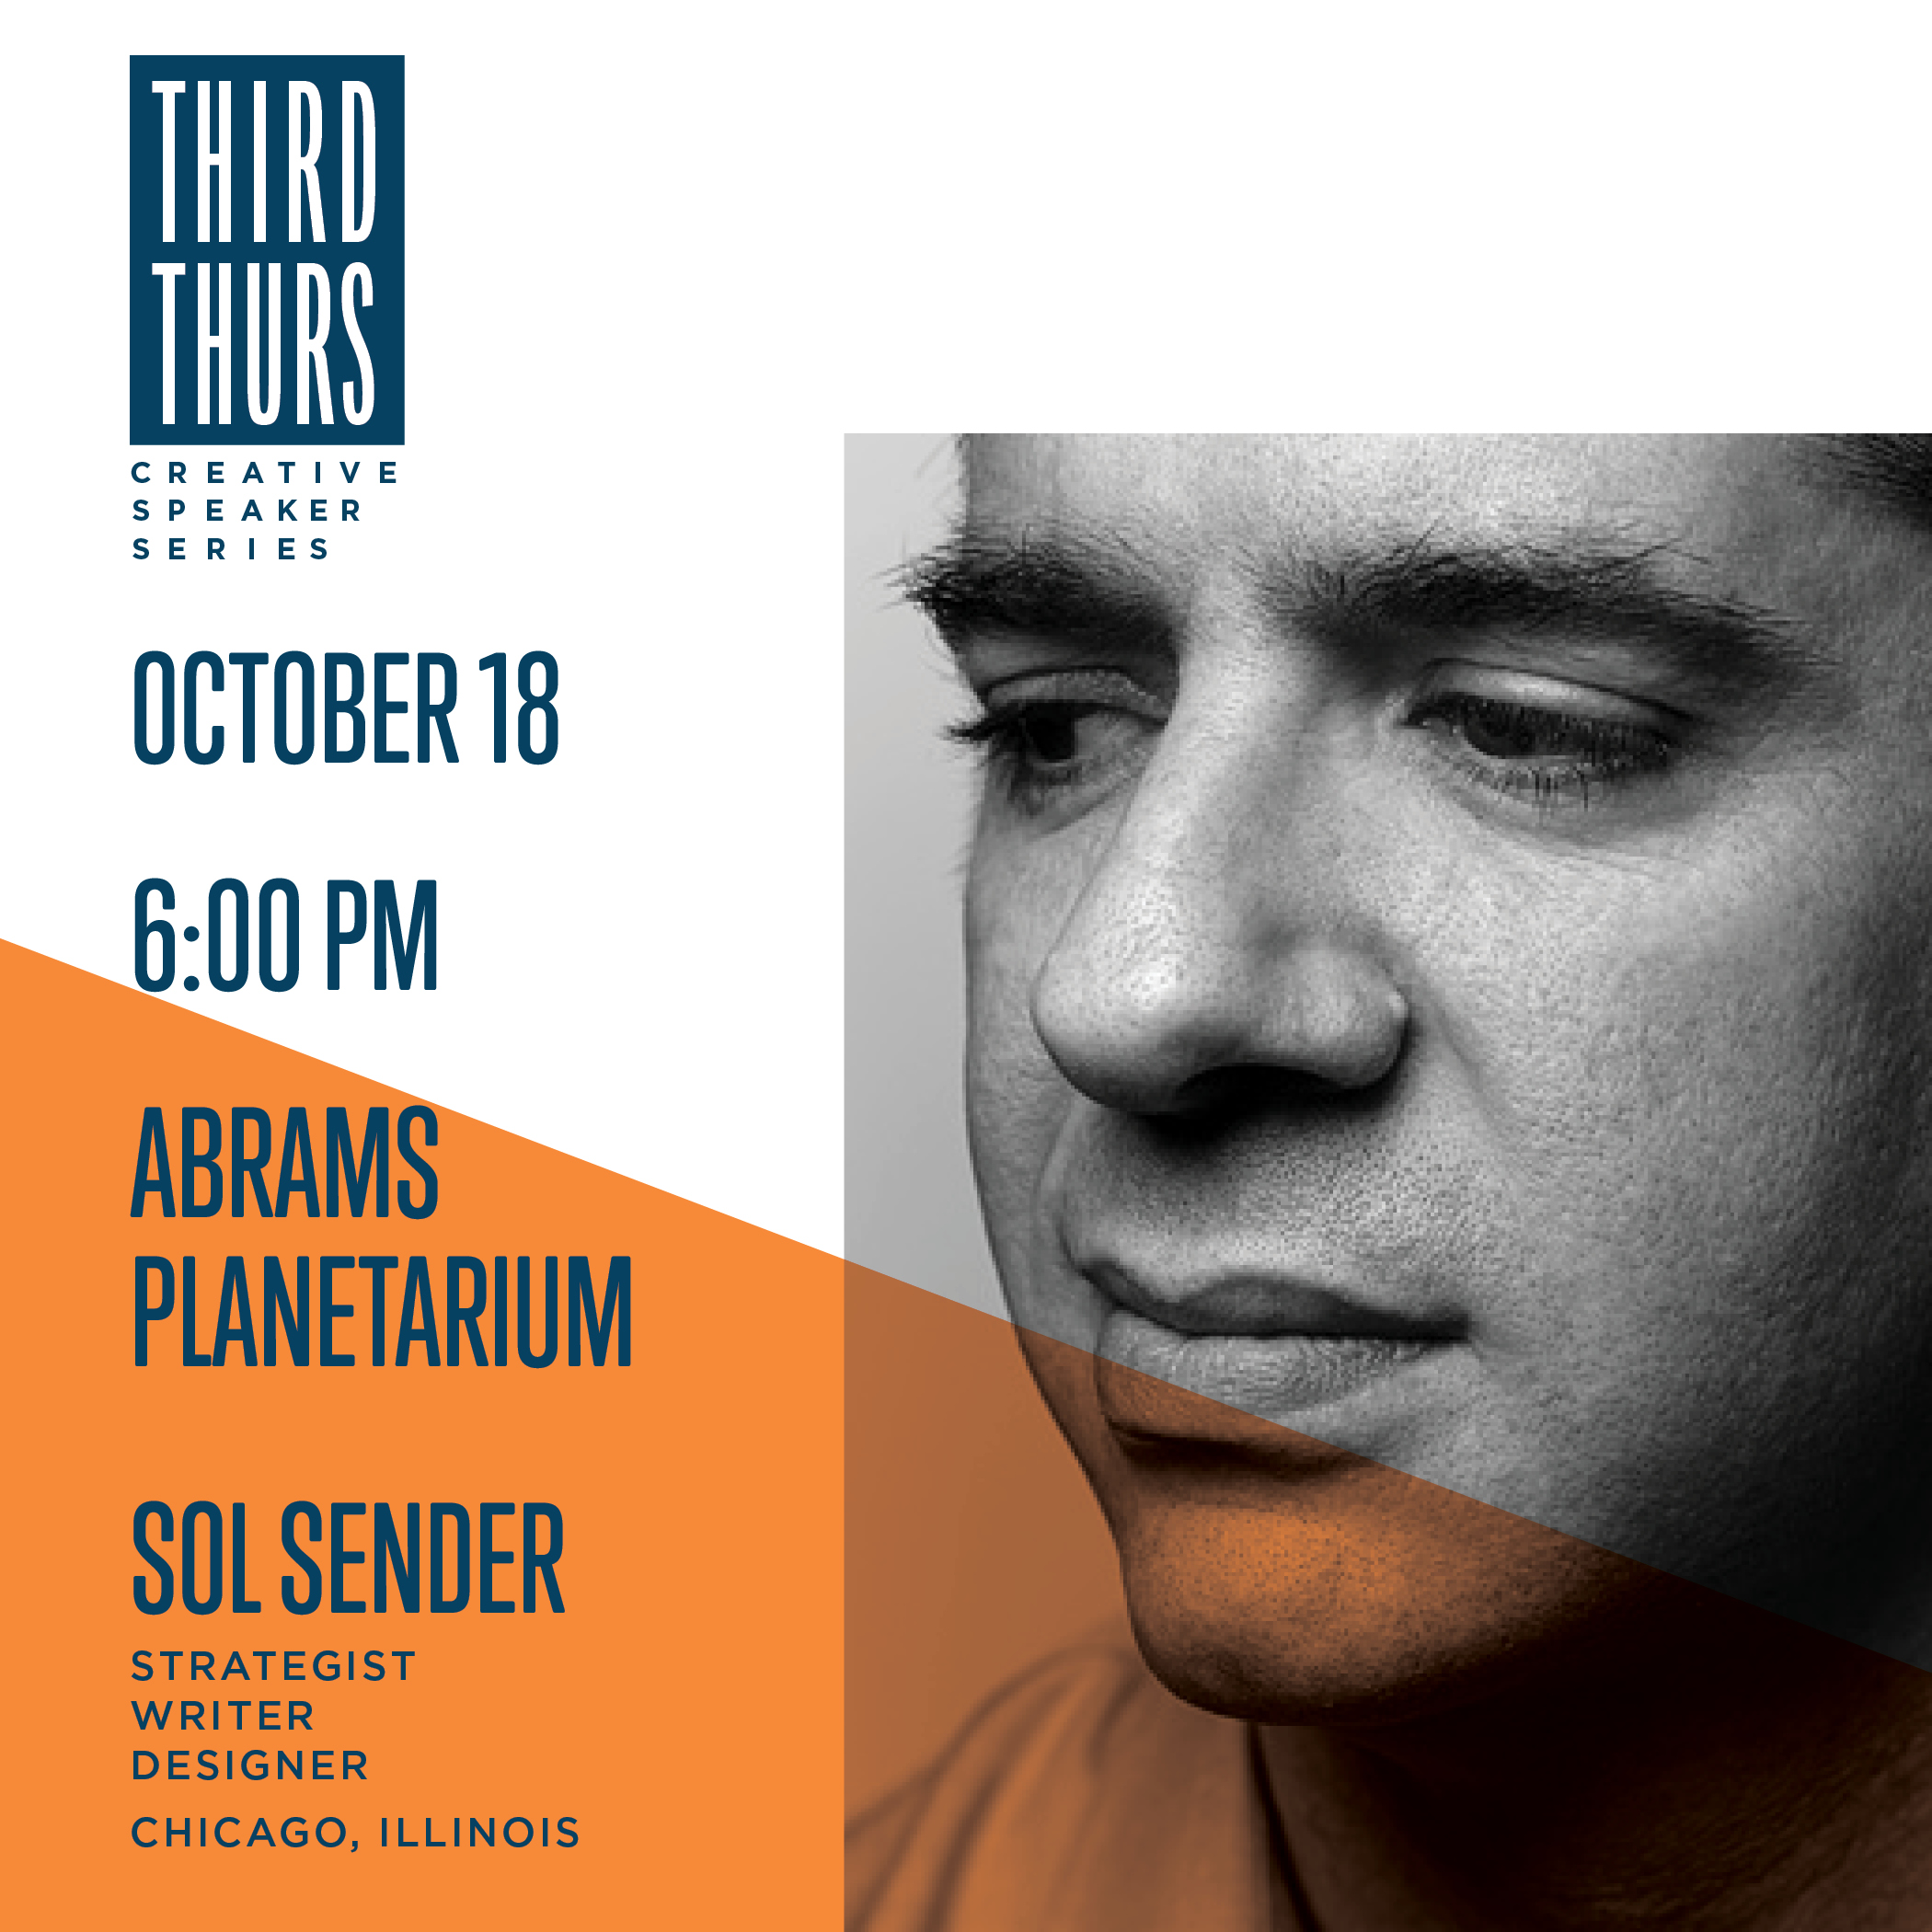 Third Thursday Creative Speaker Series Presents Sol Sender @ Abrams Planetarium | East Lansing | Michigan | United States